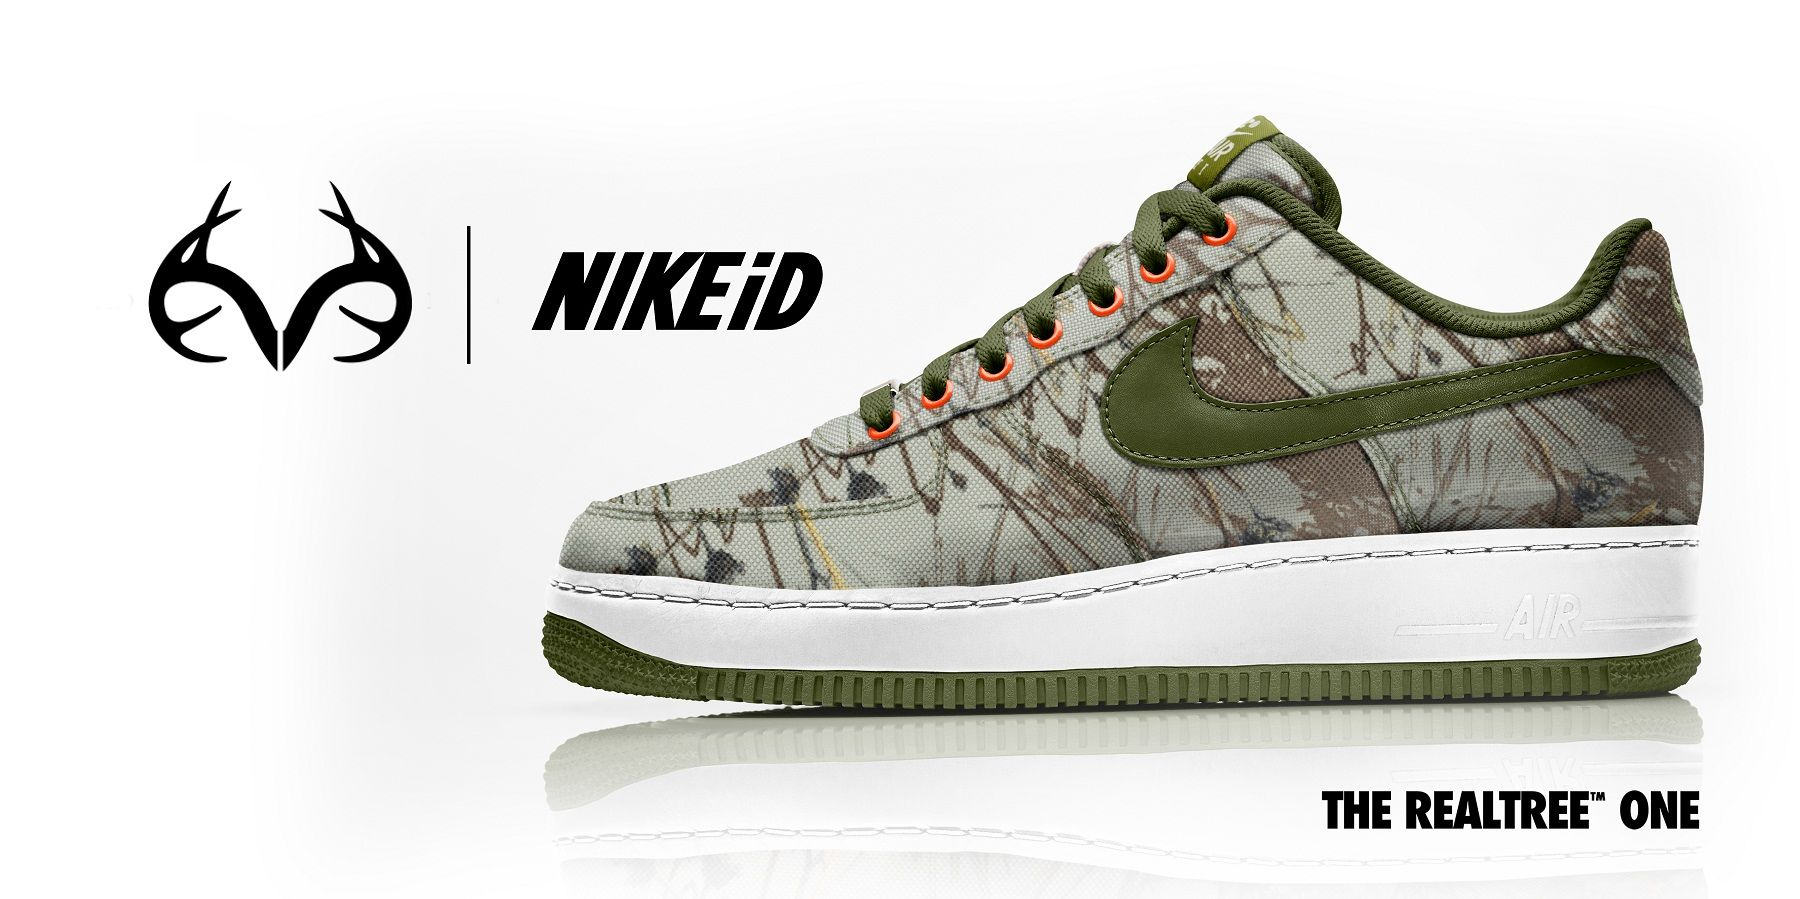 Customized Realtree Camo Nike Sneakers